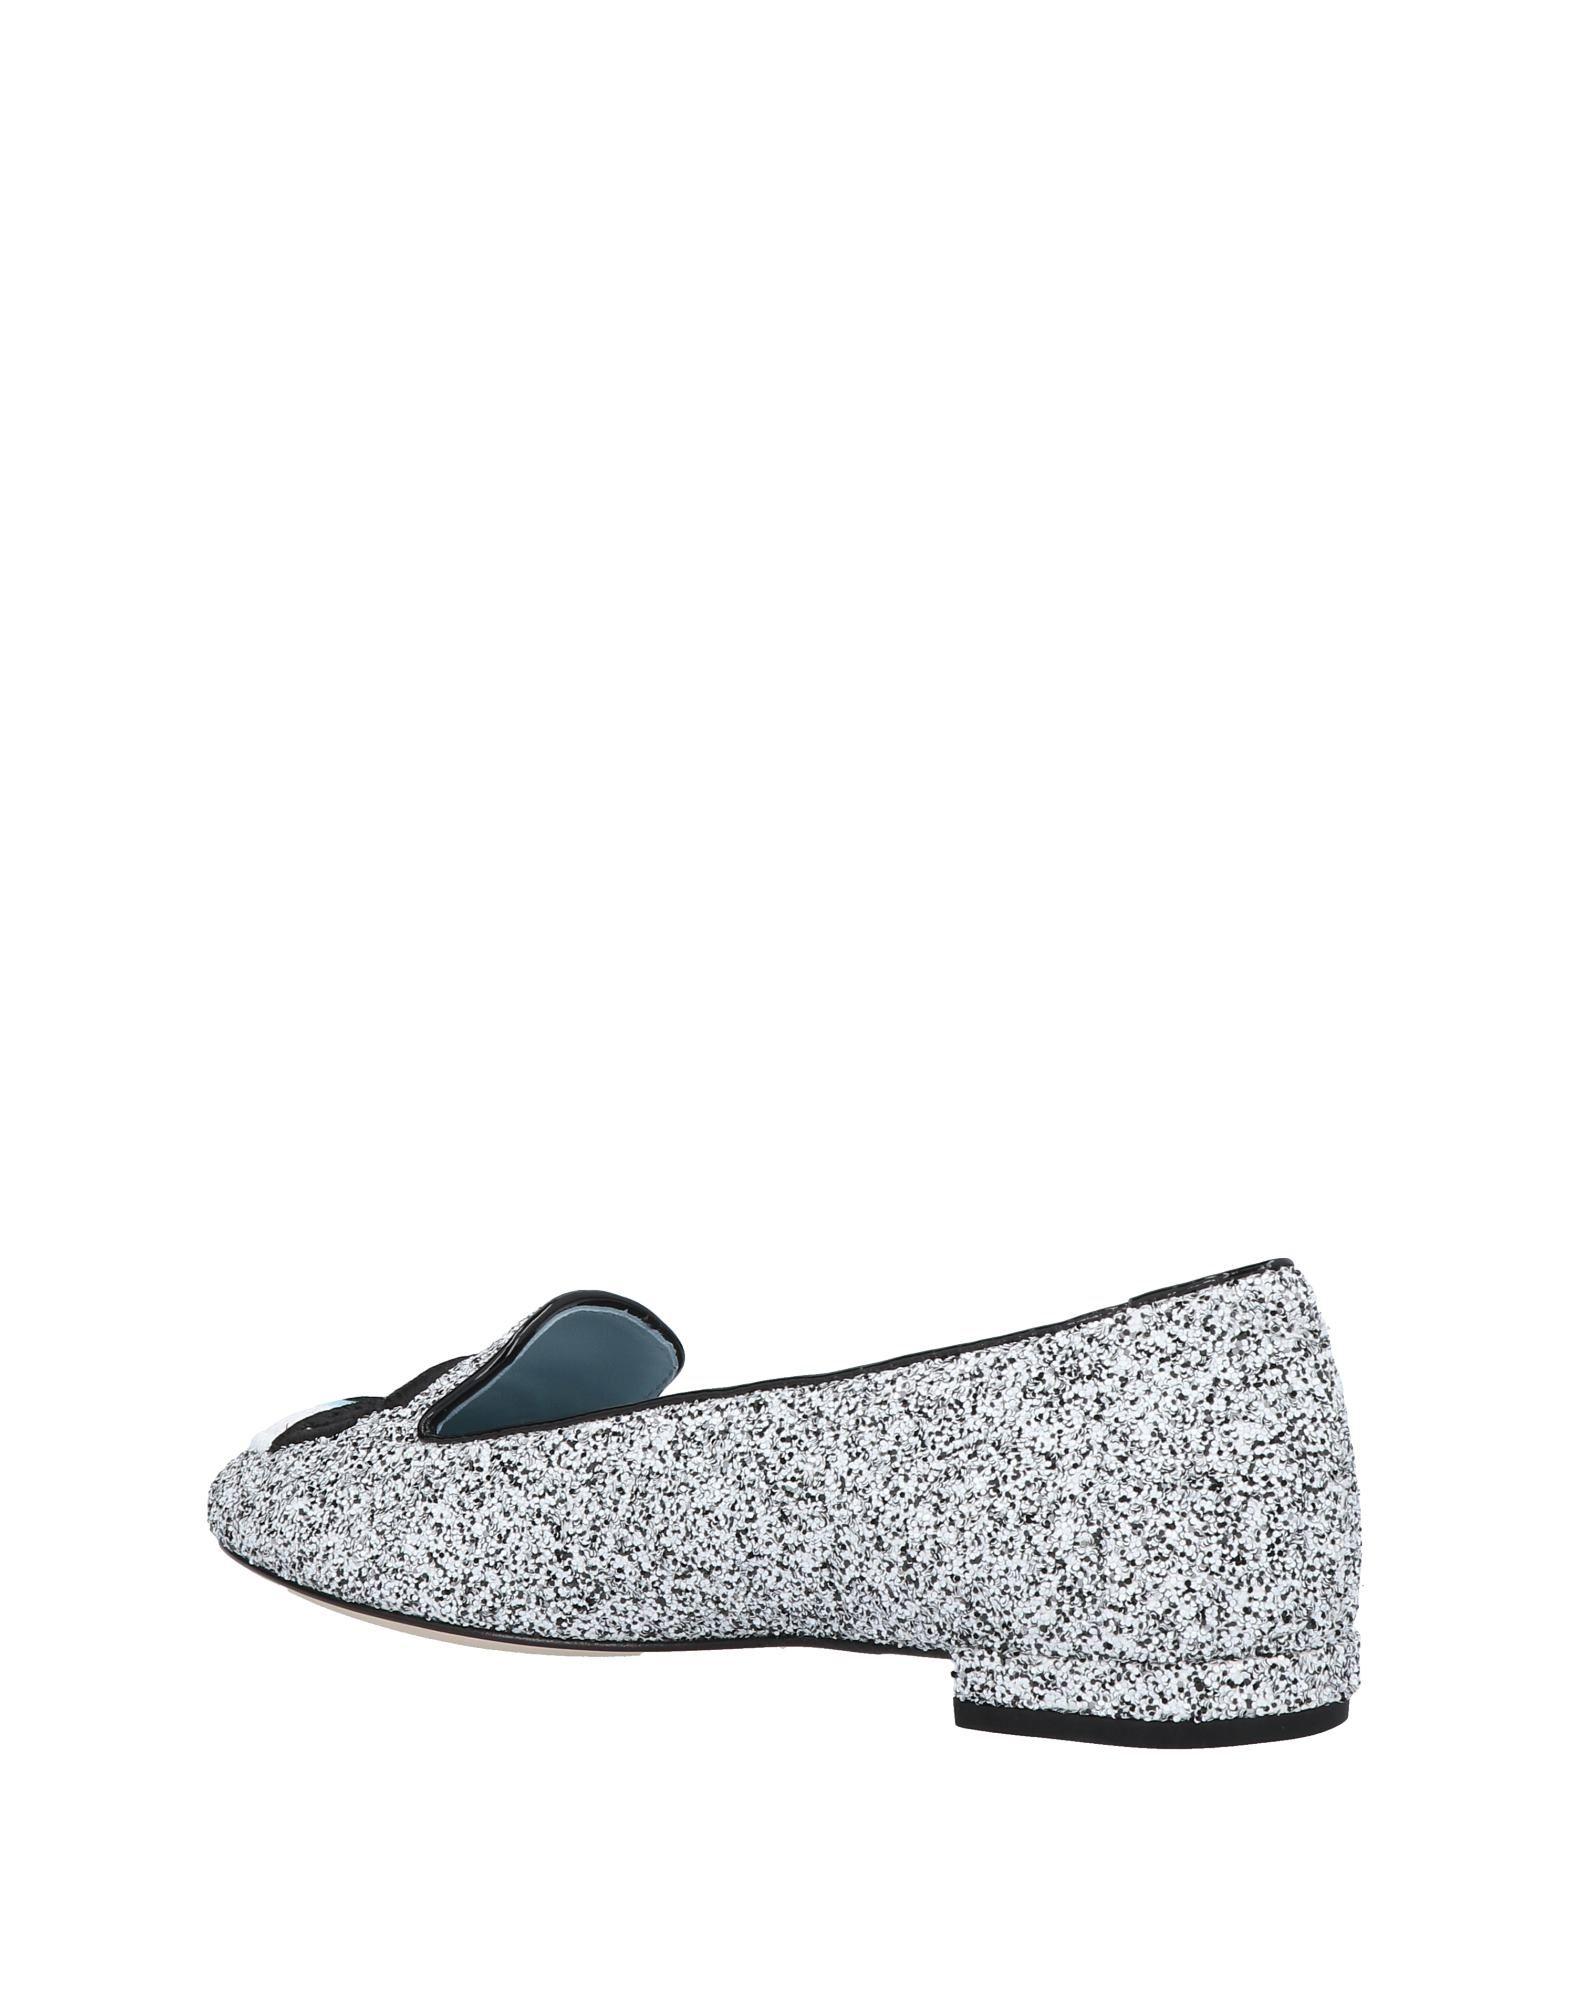 Stilvolle billige Schuhe Schuhe Schuhe Chiara Ferragni Mokassins Damen  11453705JA 3b72c1